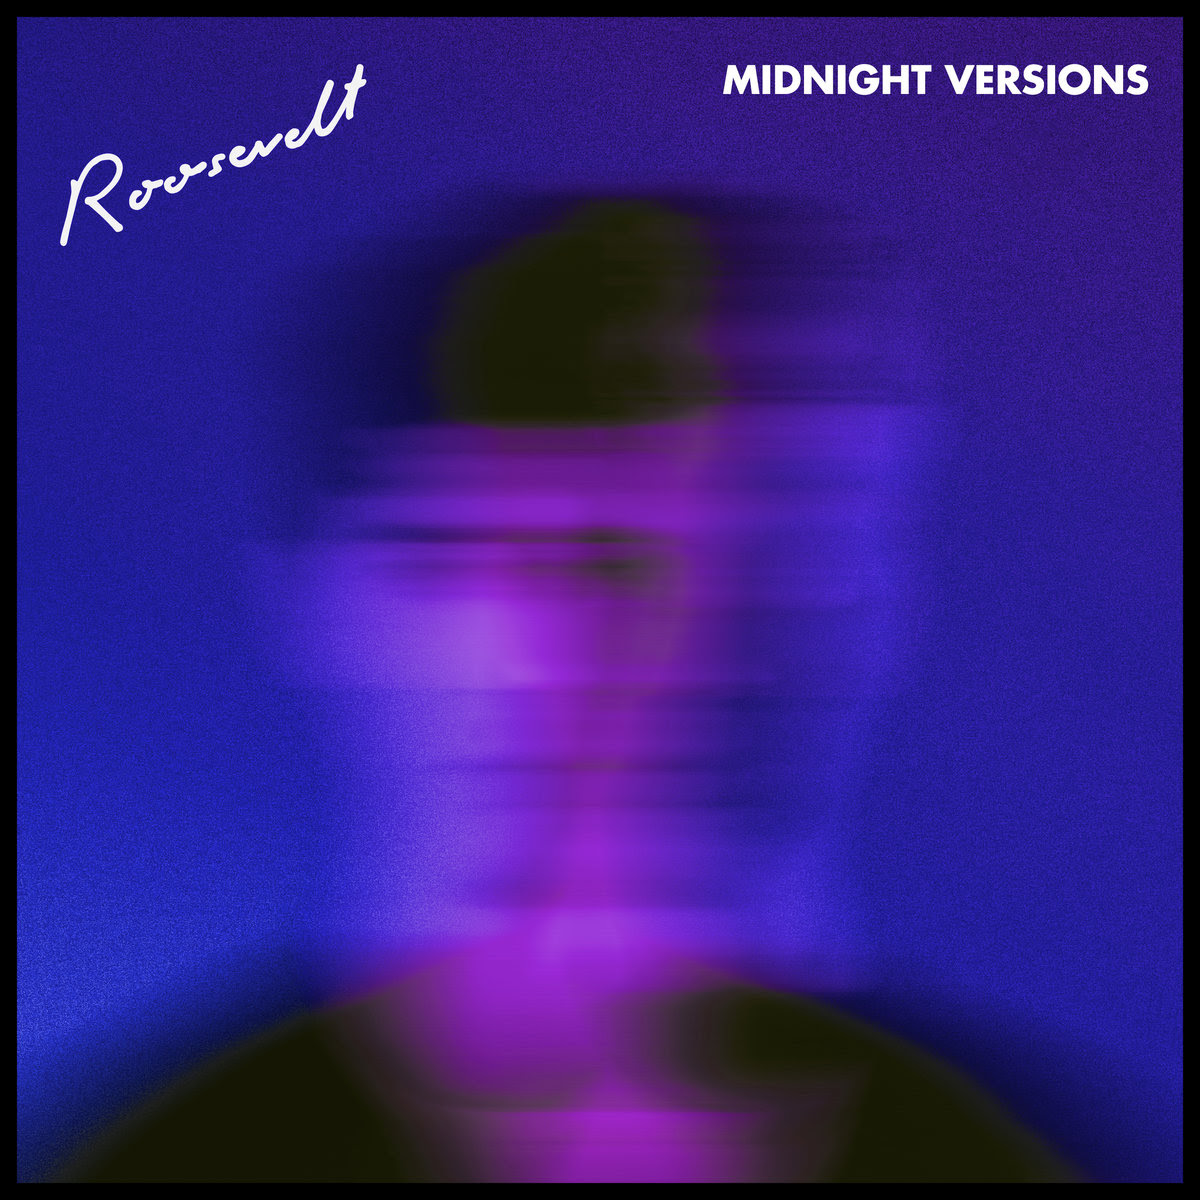 Roosevelt — Midnight Versions EP